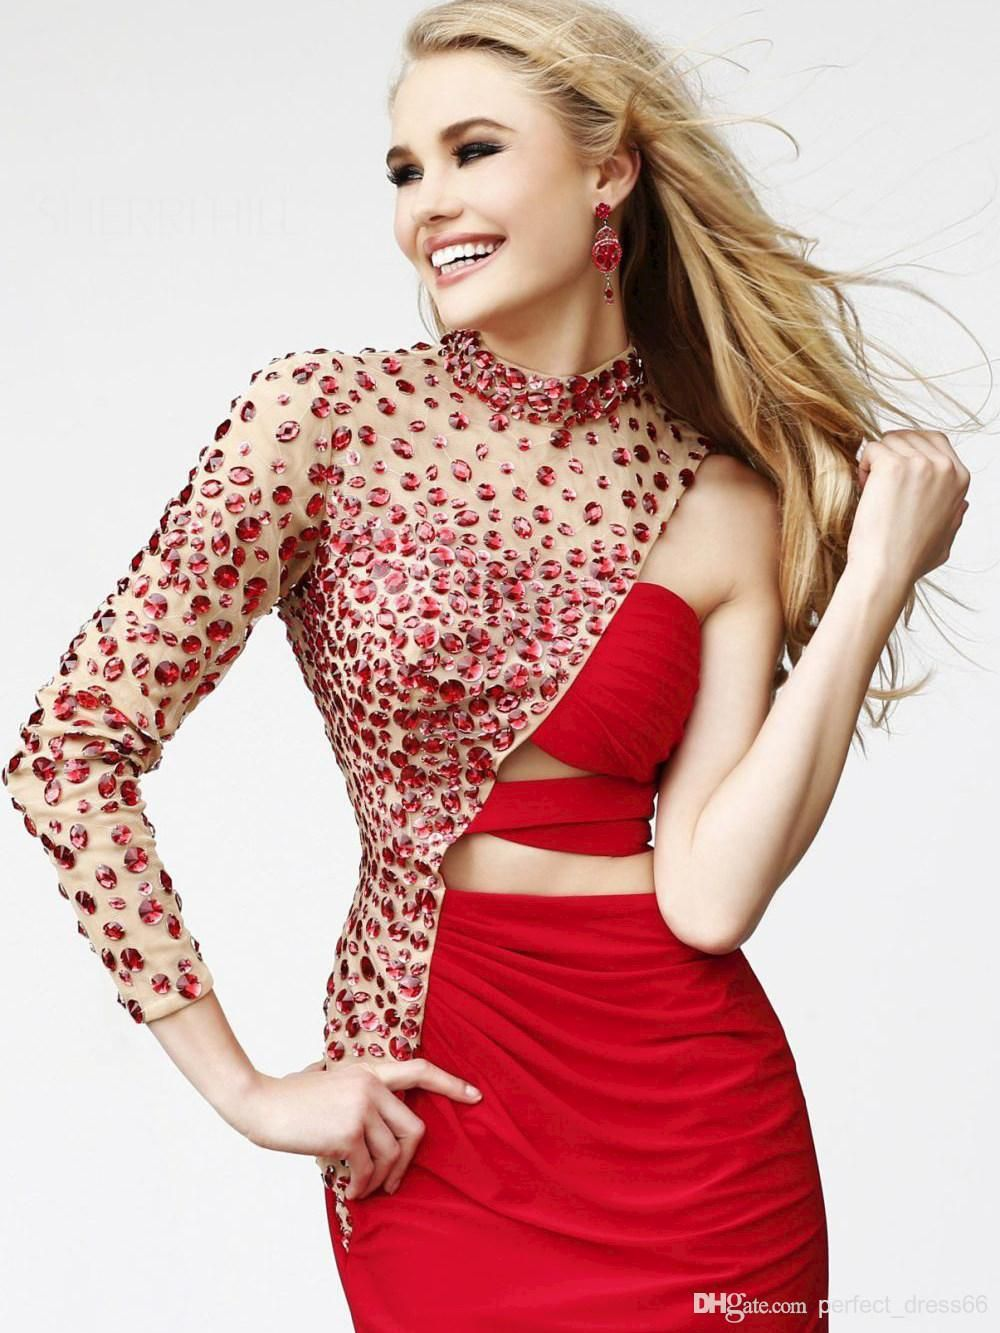 Discount crystals one shoulder transparent formal dresses with high